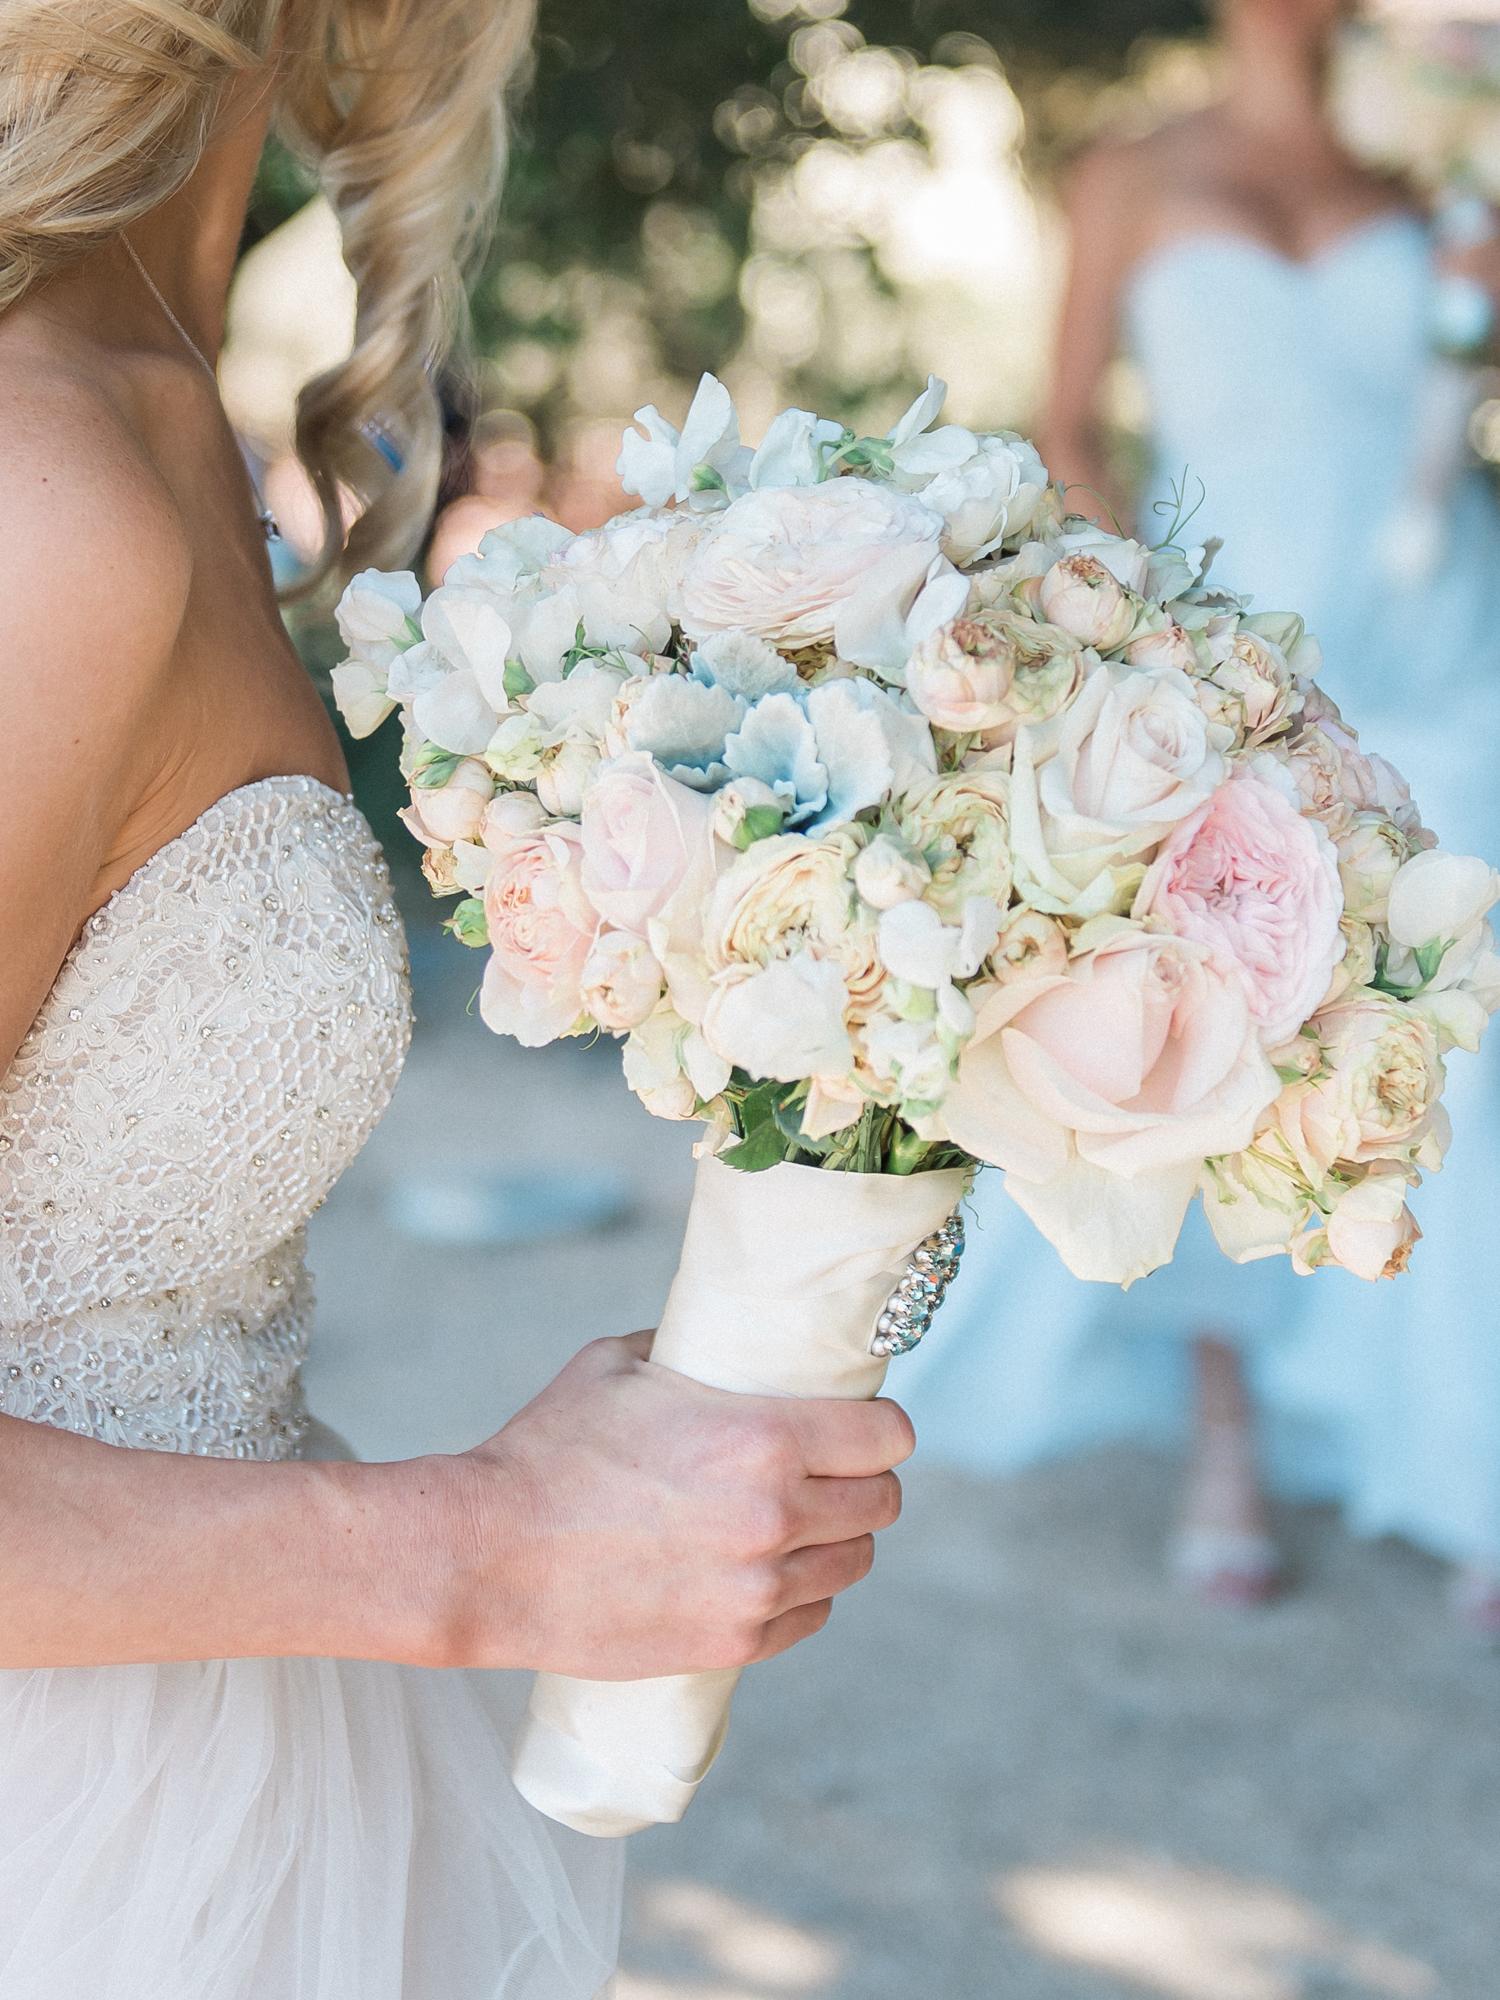 Aimee+Logan_wedding_spp-68.jpg